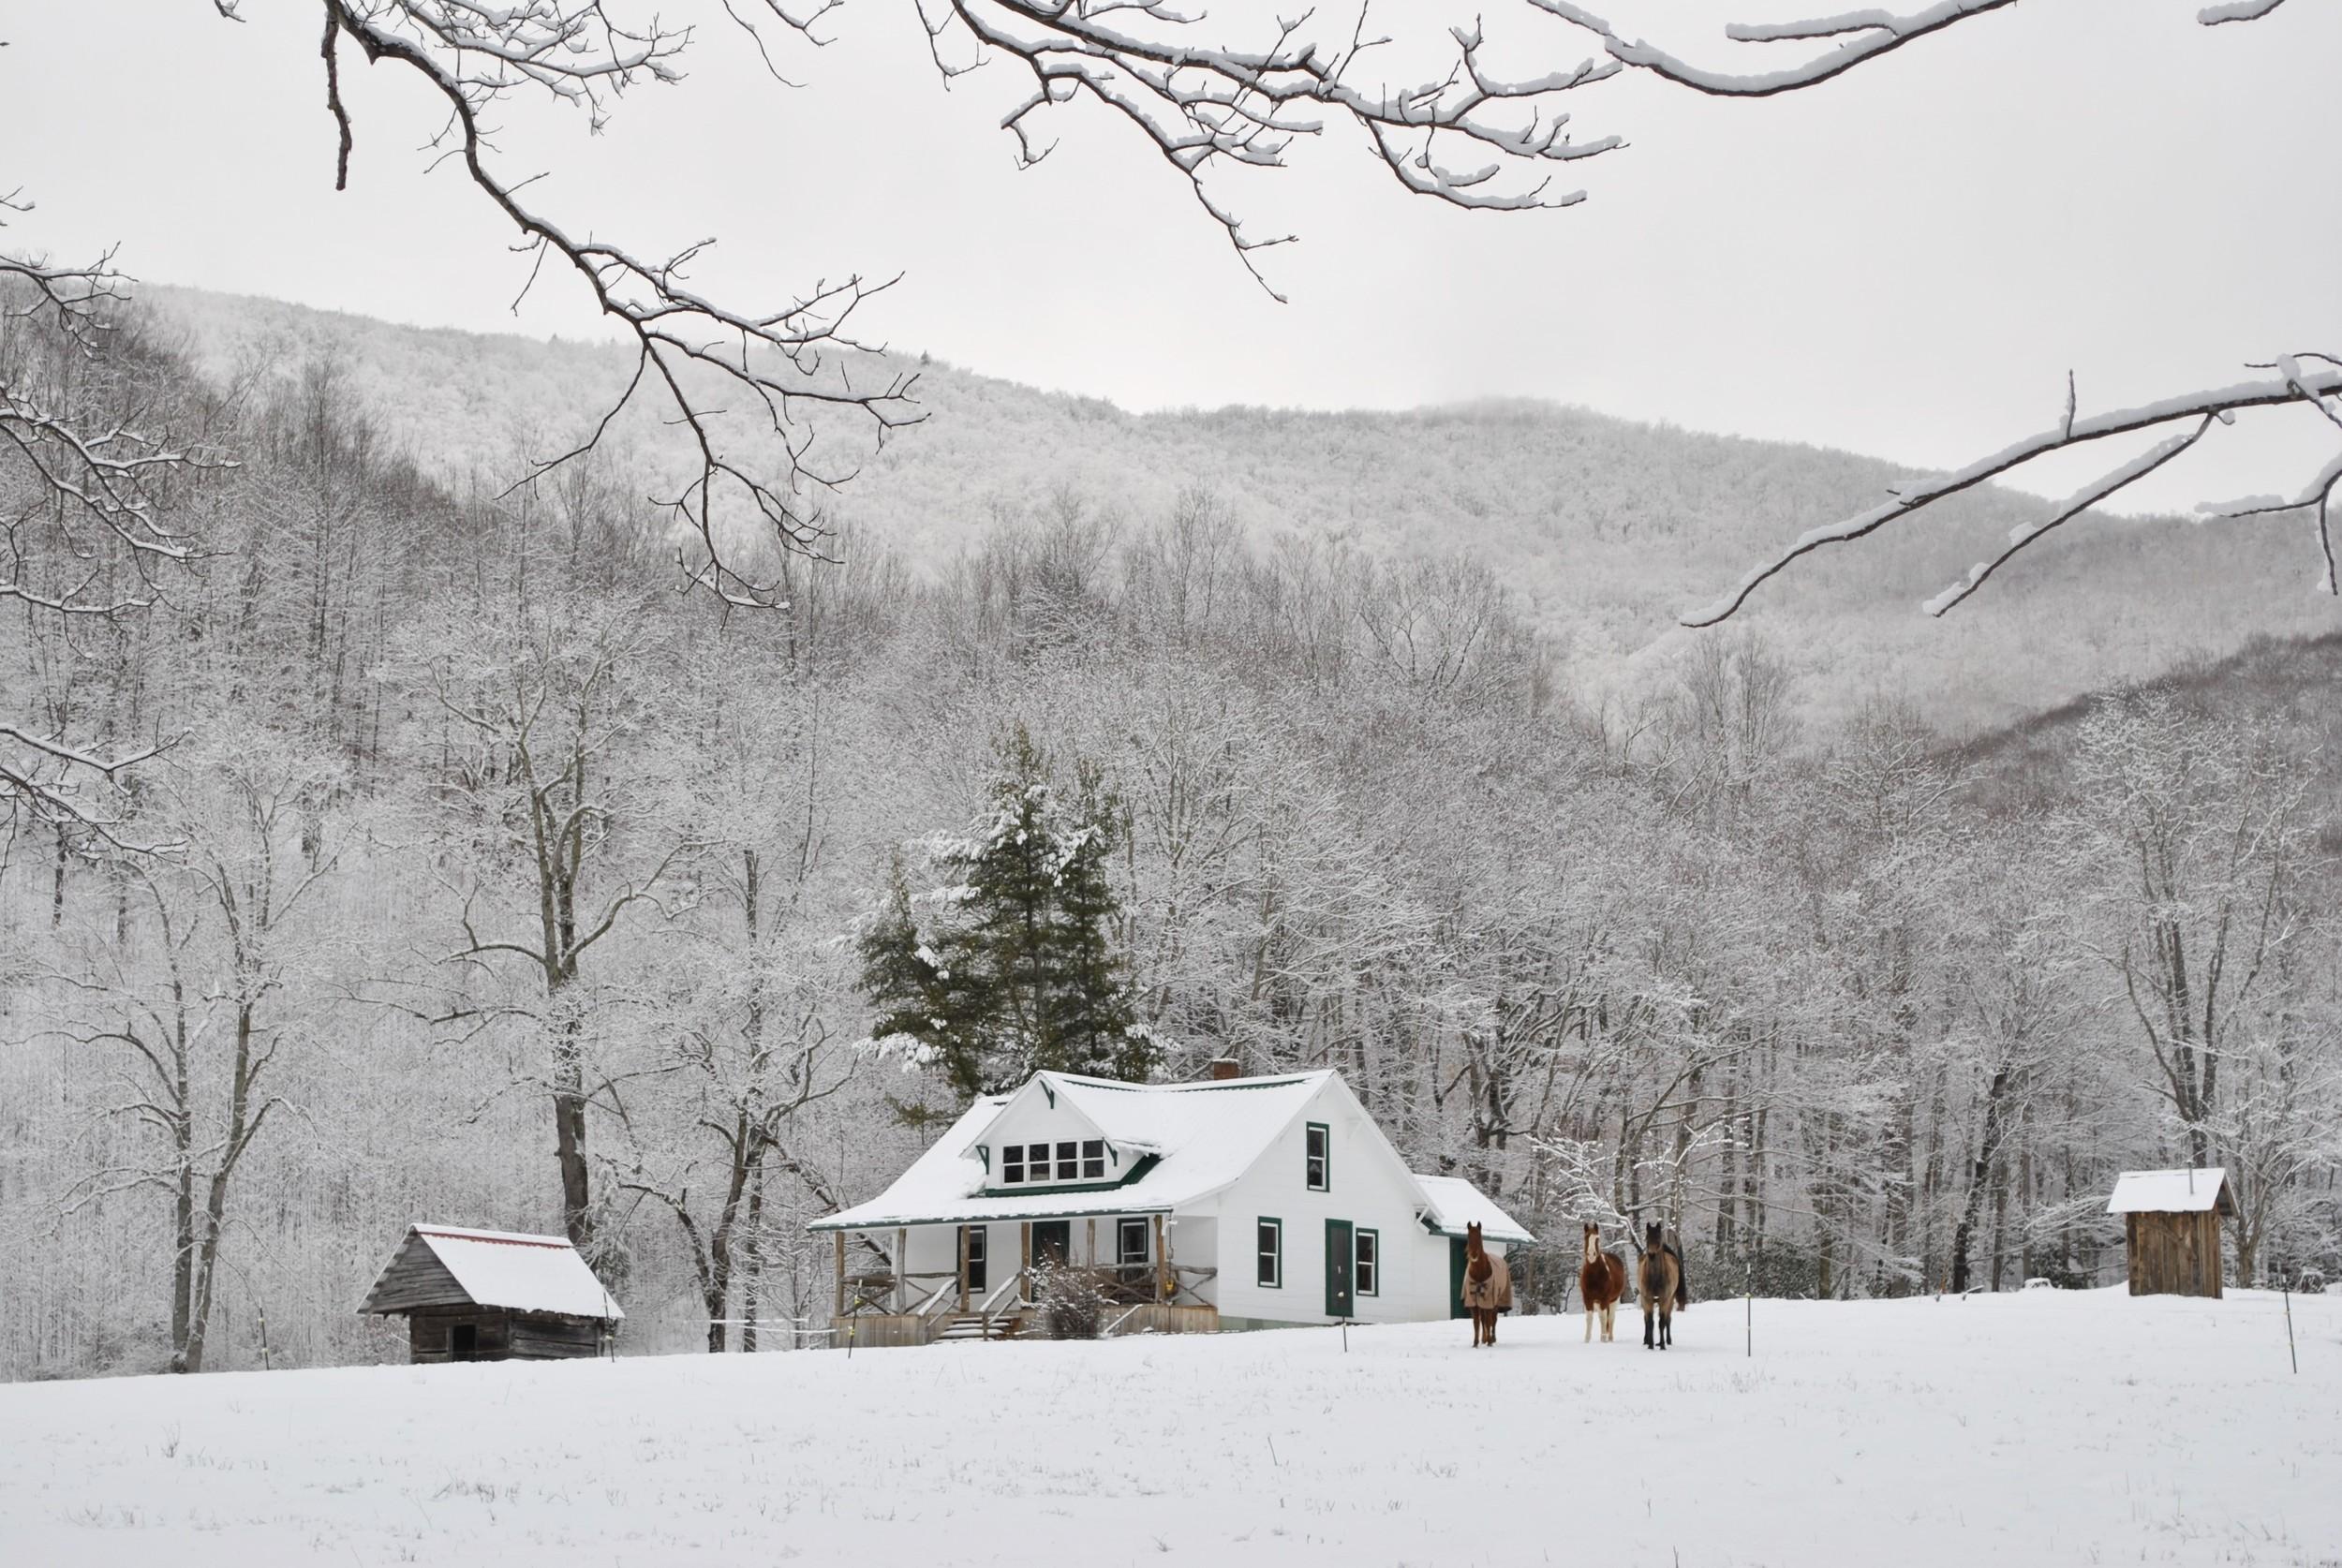 The Pioneer Homestead in Winter